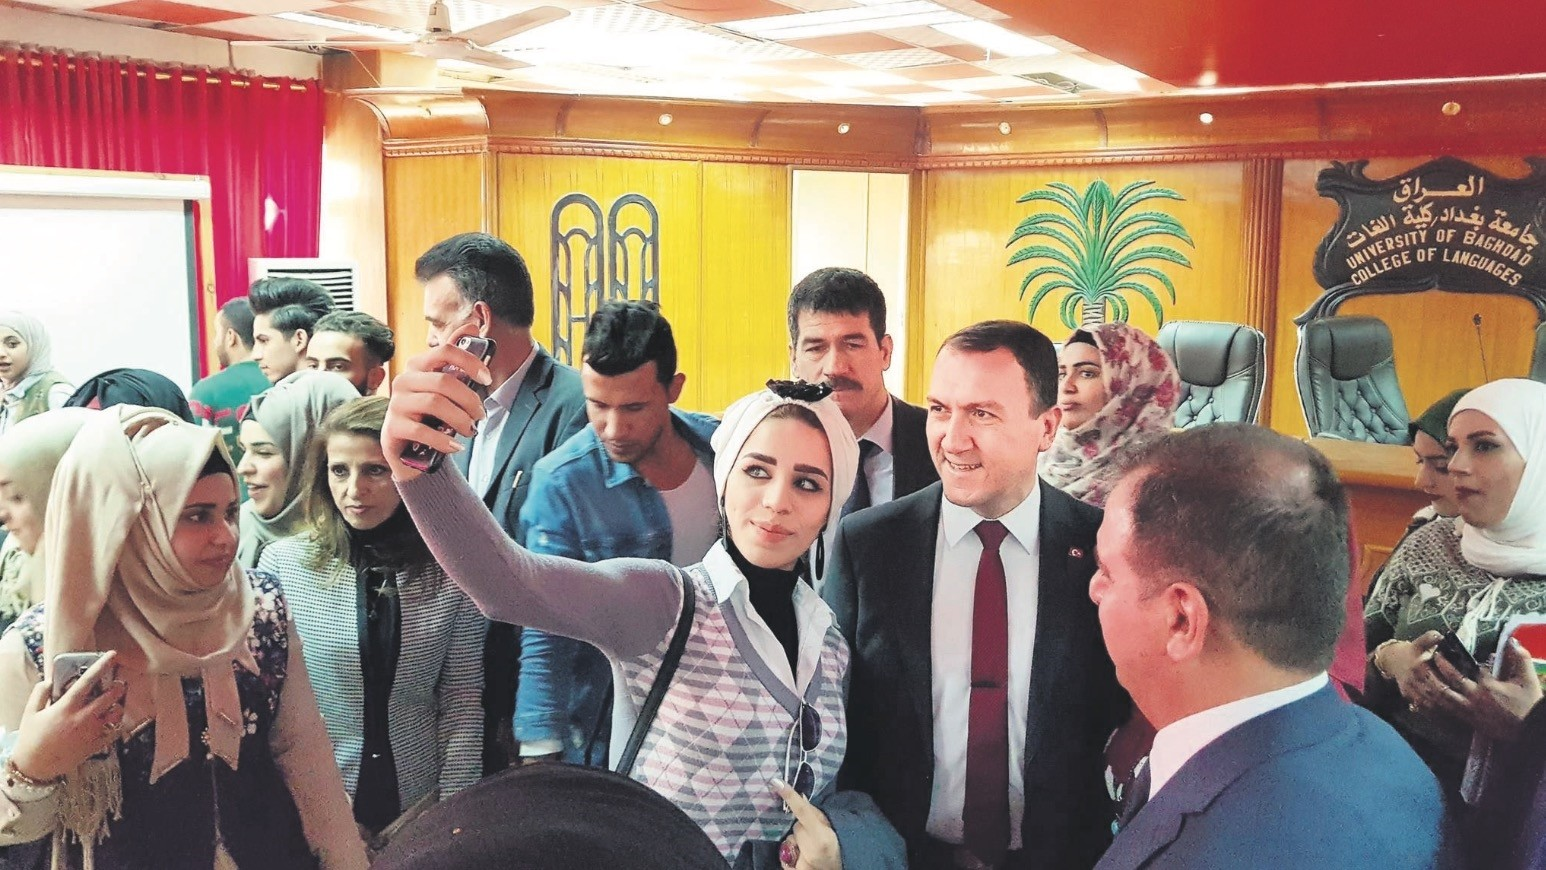 Turkey's ambassador to Baghdad, Fatih Yu0131ldu0131z, takes a selfie with one of the Iraqi locals.